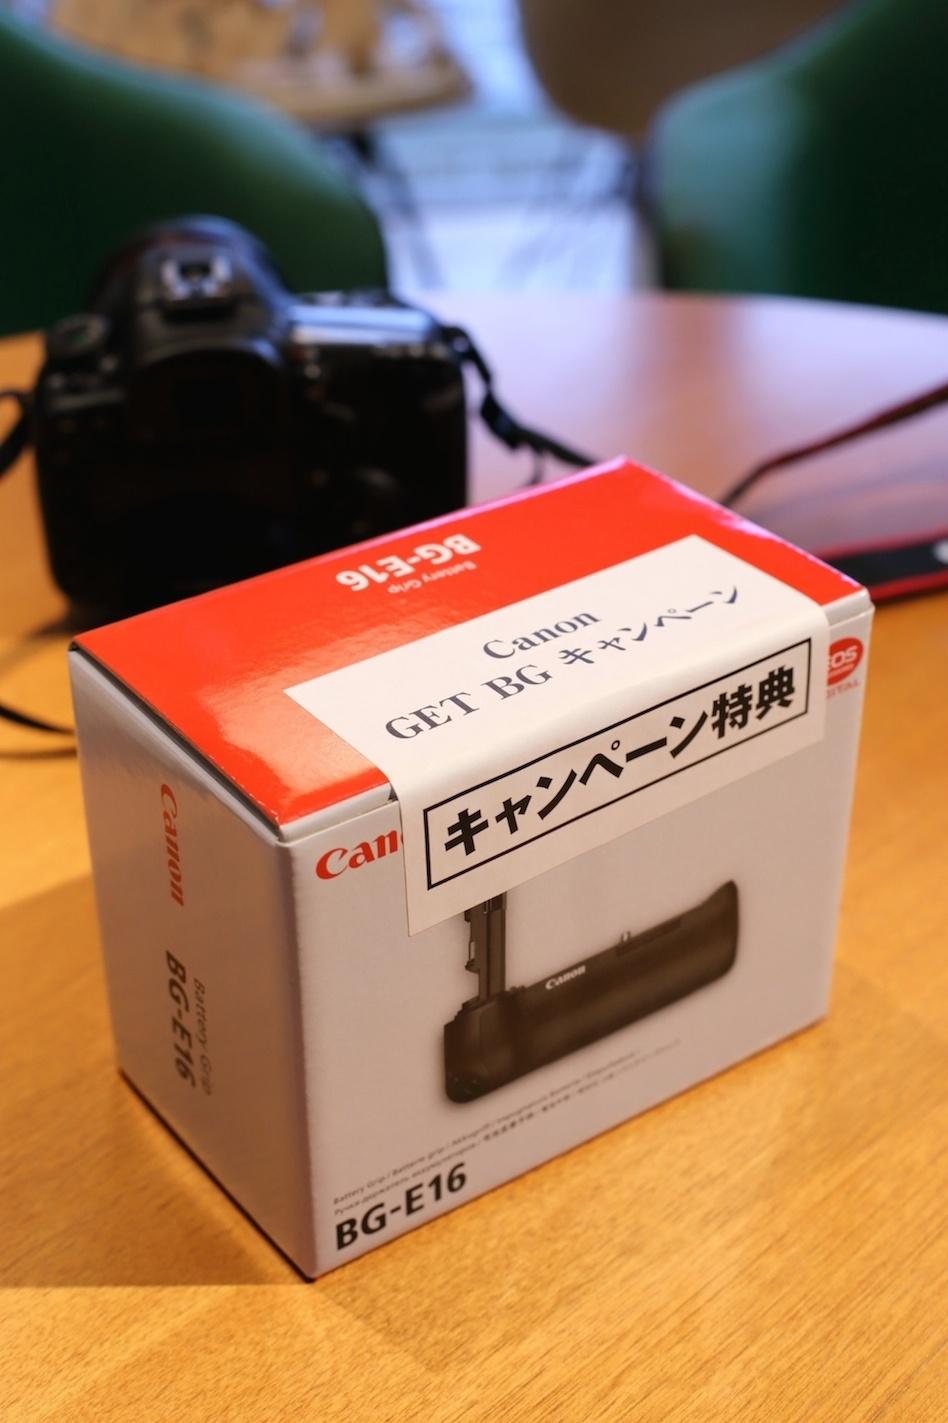 Canon EOS 7D Mark II GET BG(バッテリーグリップ)キャンペーン_d0081605_14331779.jpg